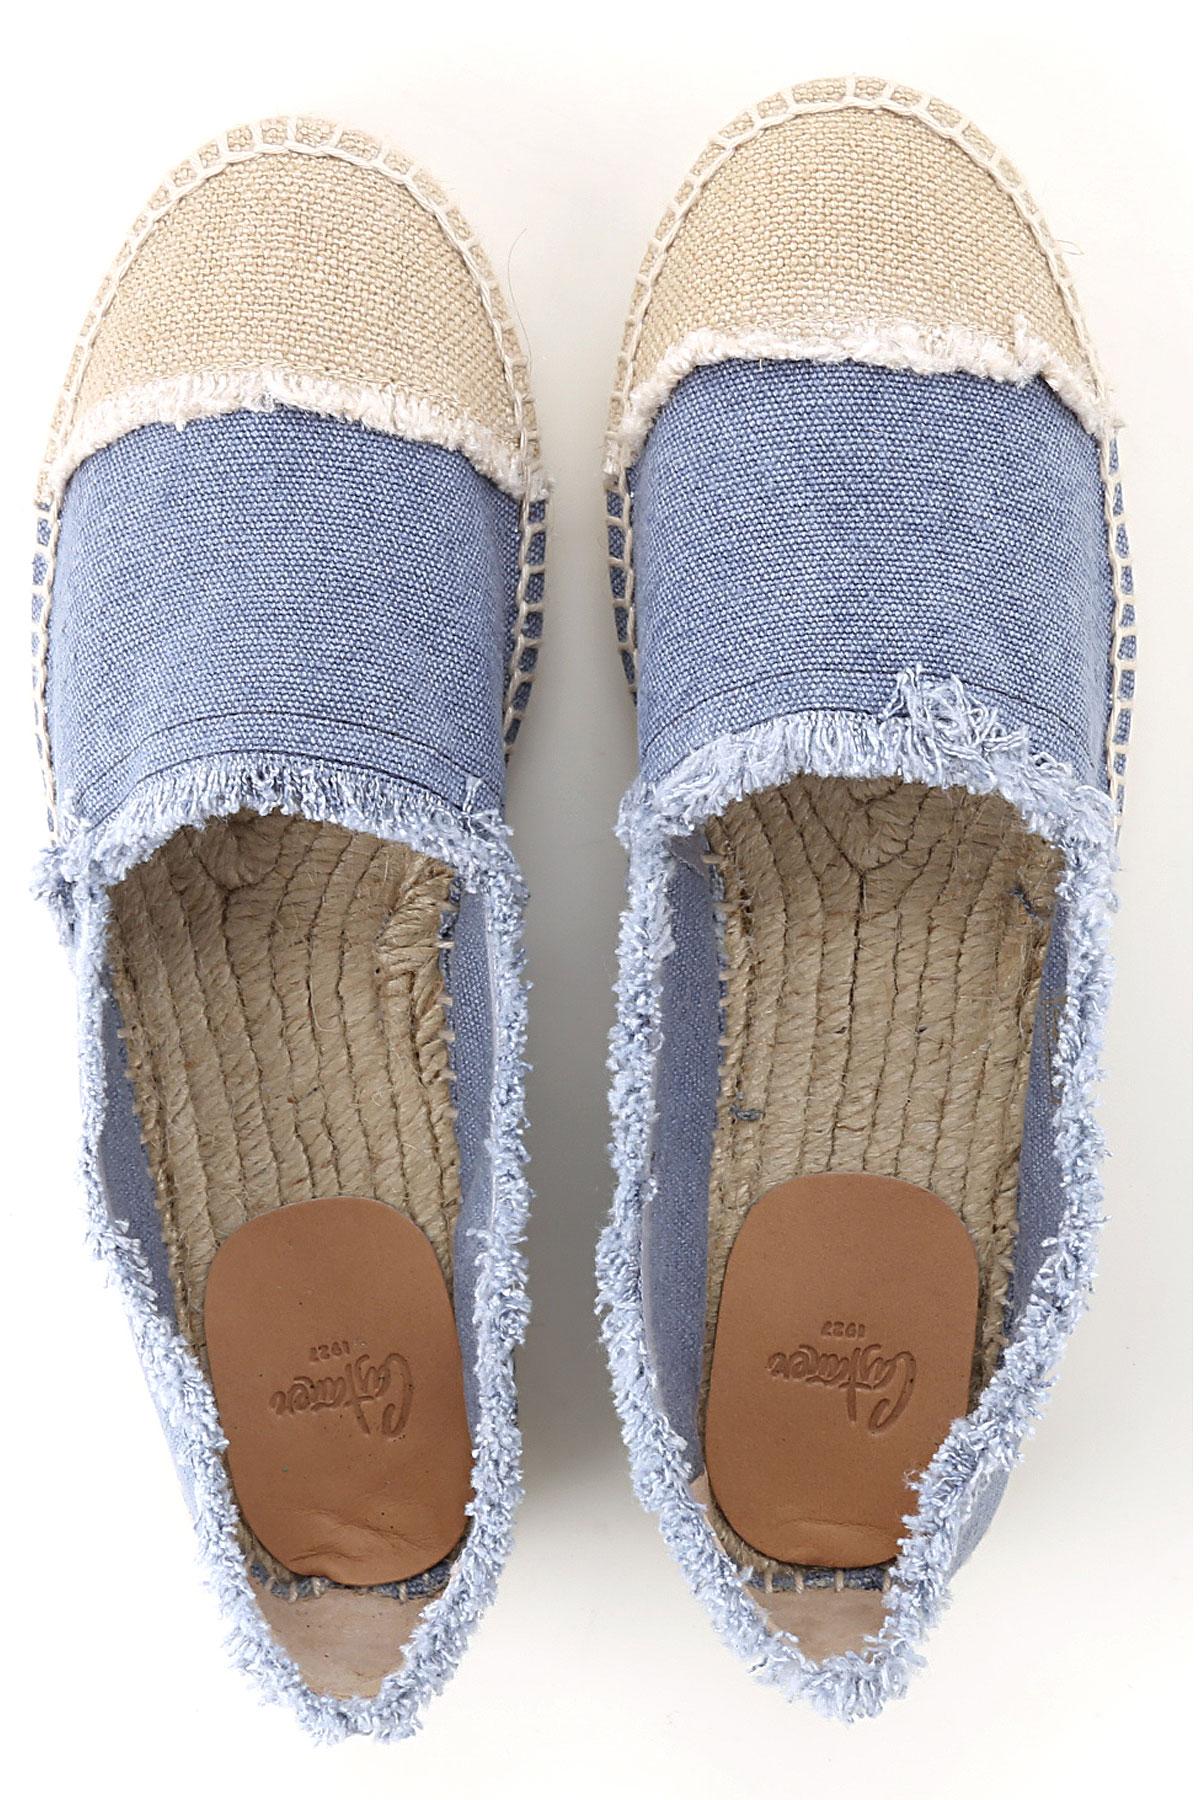 verano Natural Para Primavera Vaquero 2019 Mujer Zapatos Castaner gITwxq0g